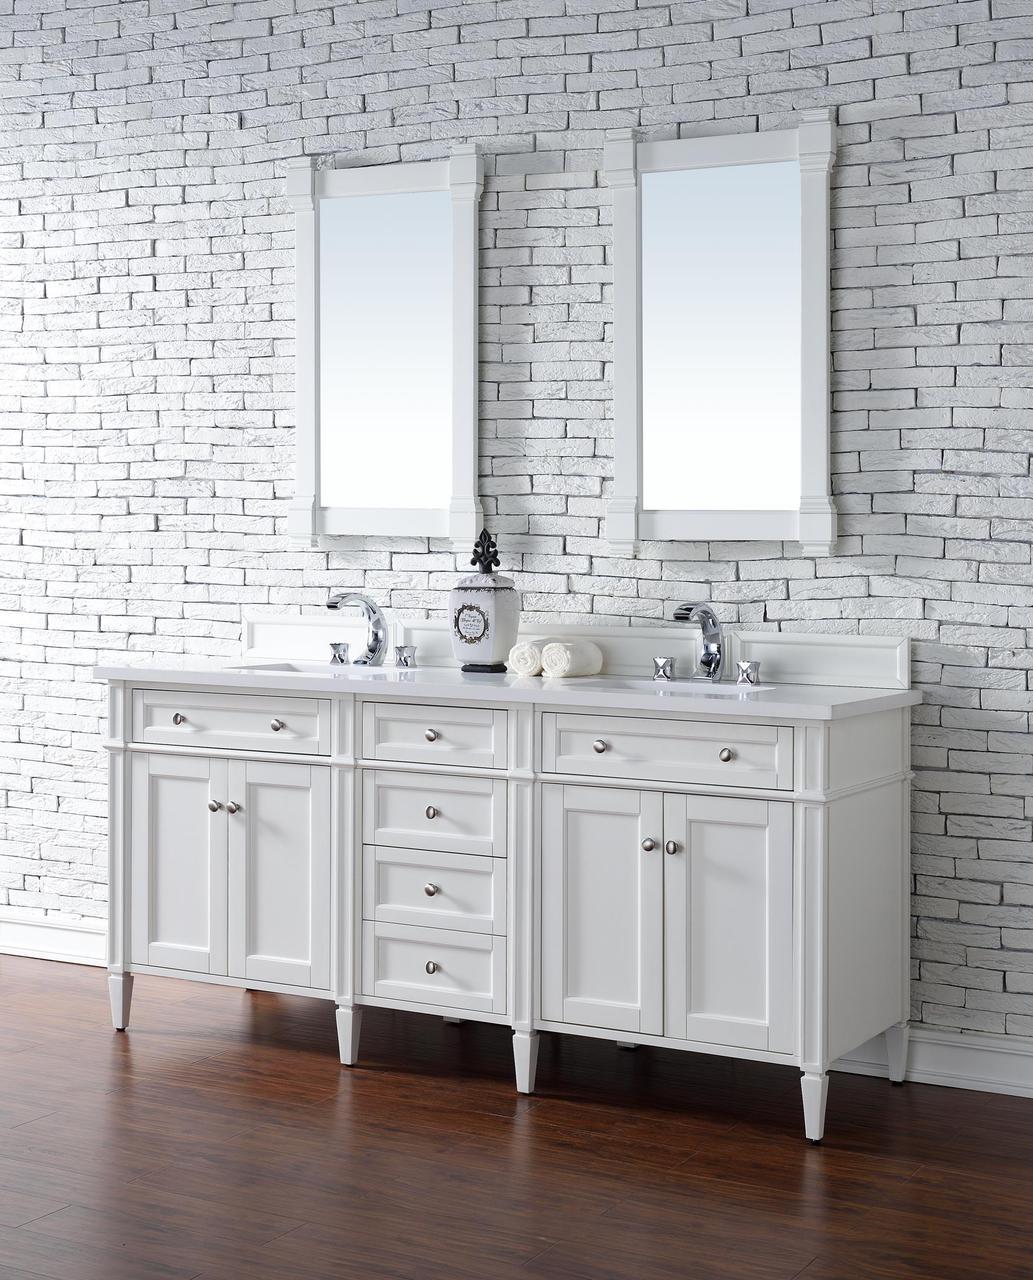 Modern Bathroom Vanity No Top : James martin brittany collection quot double vanity